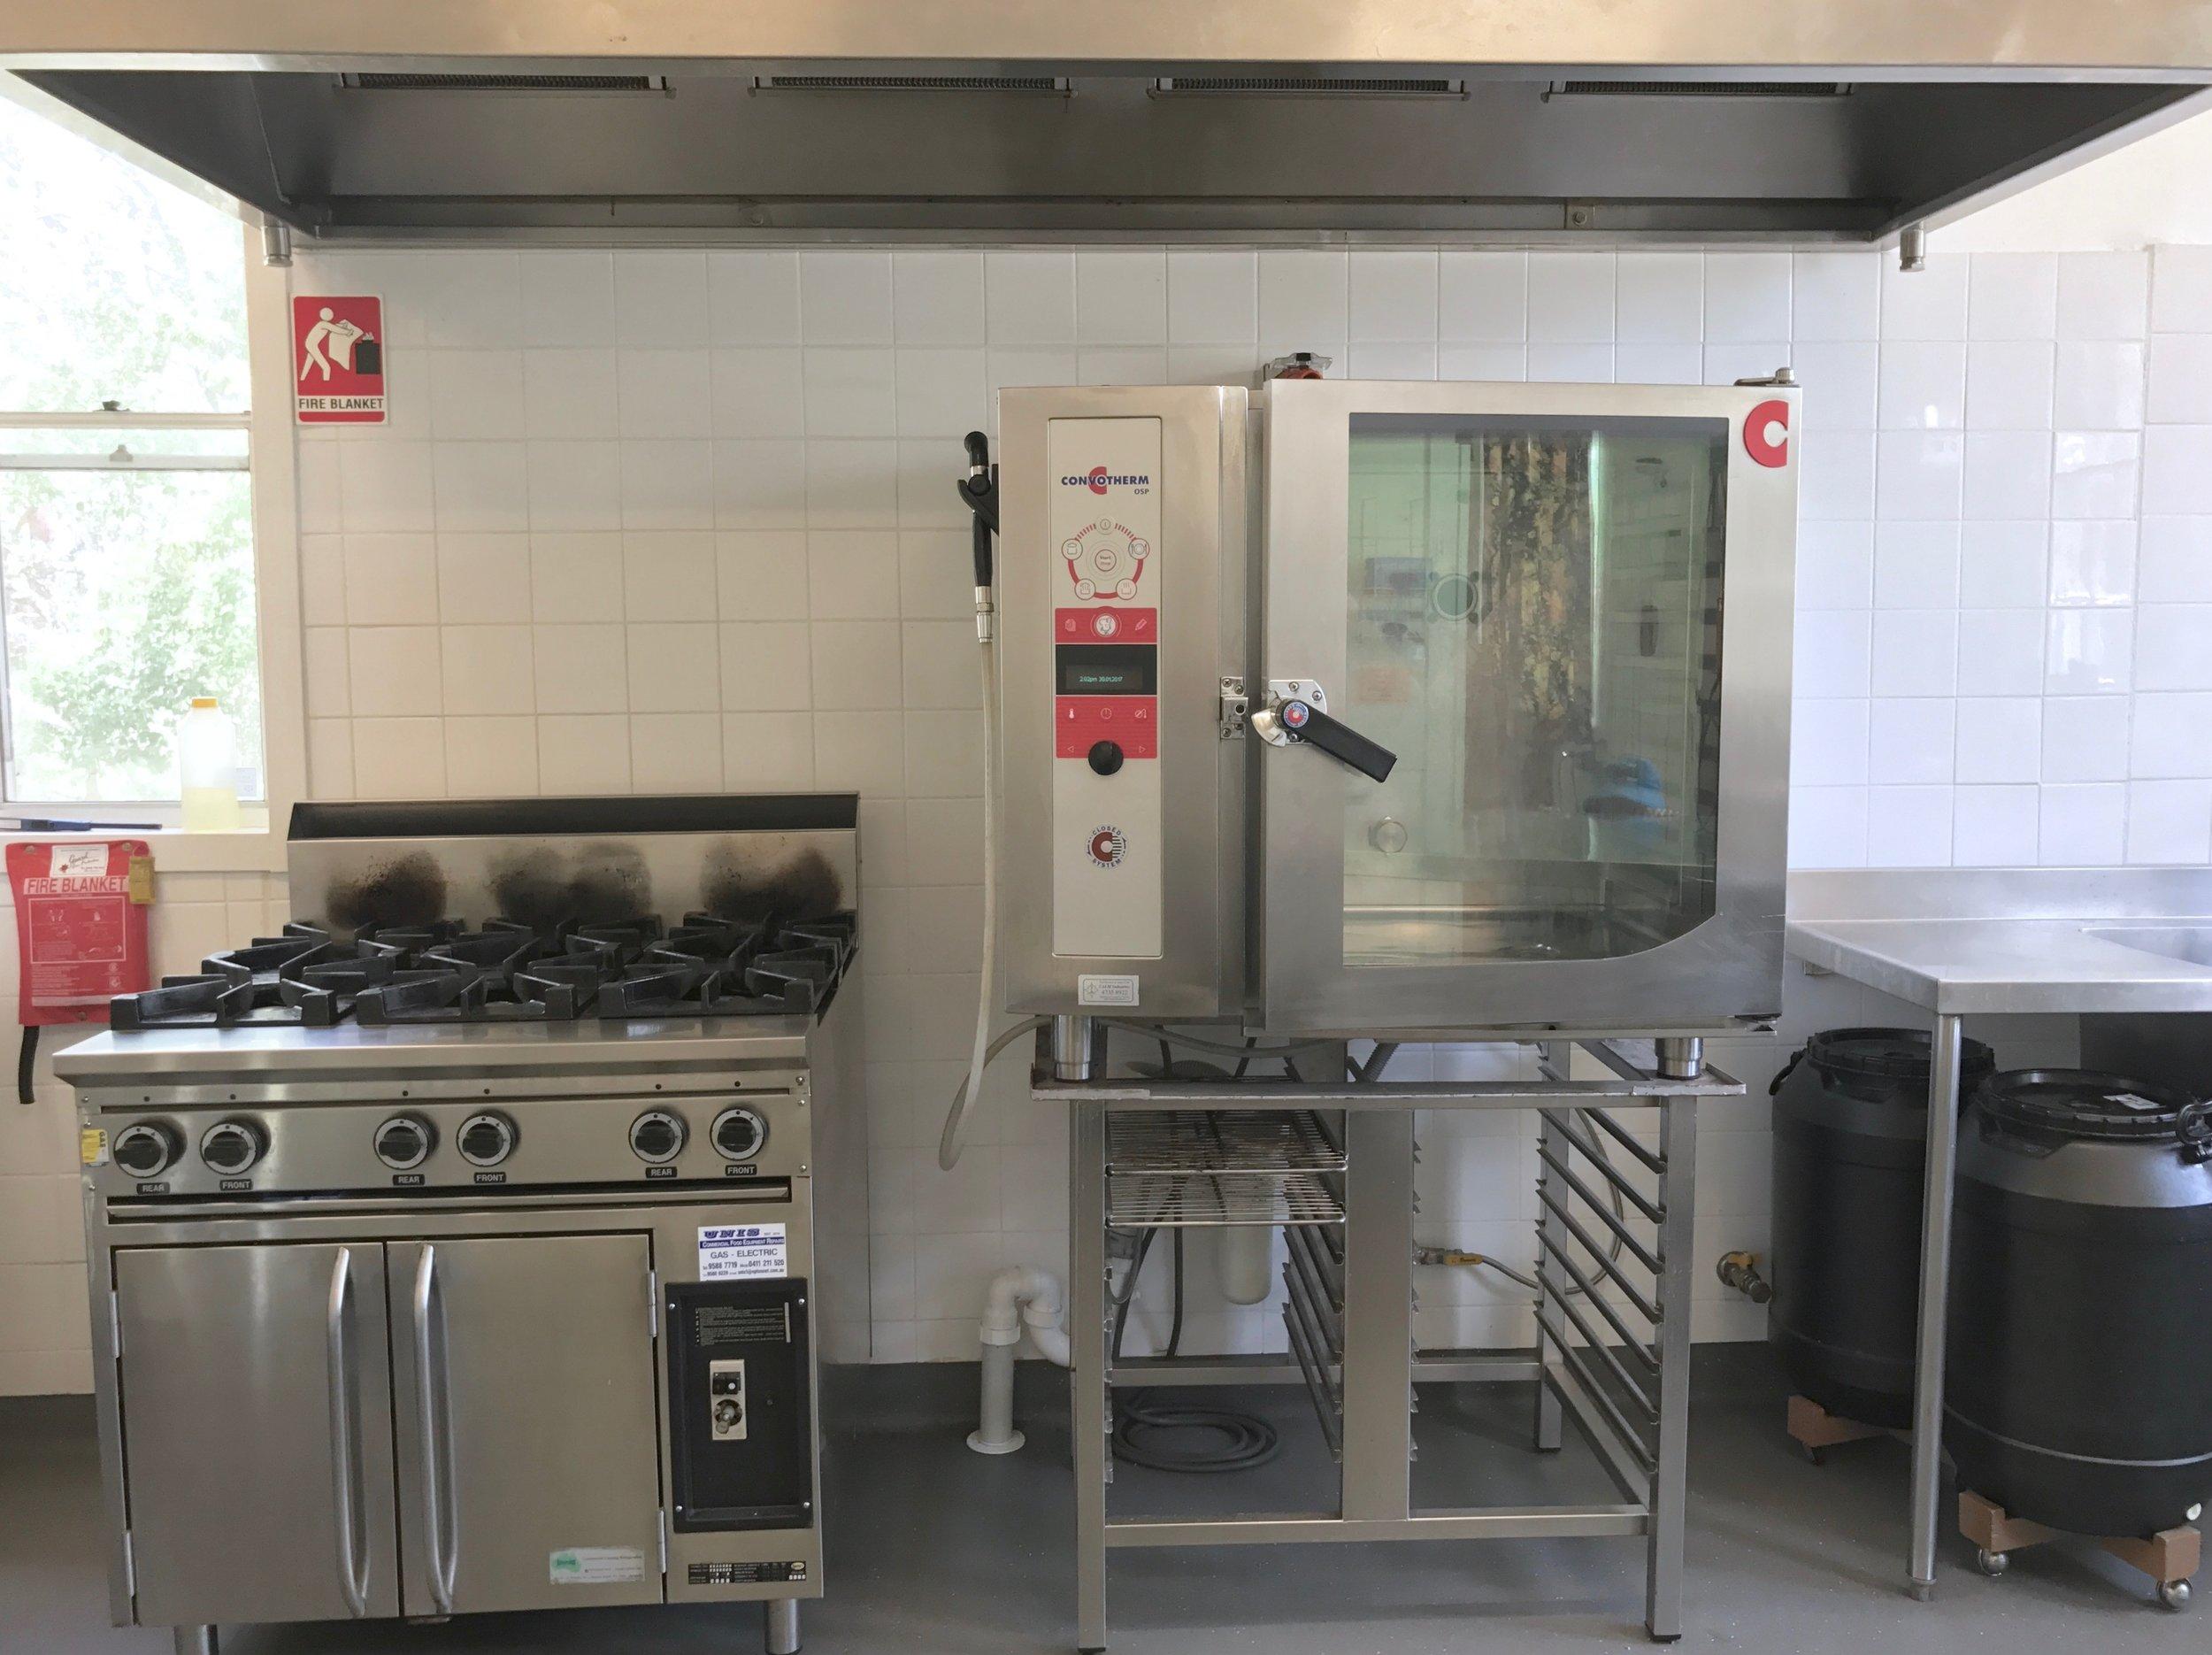 kitchen ovens.jpg